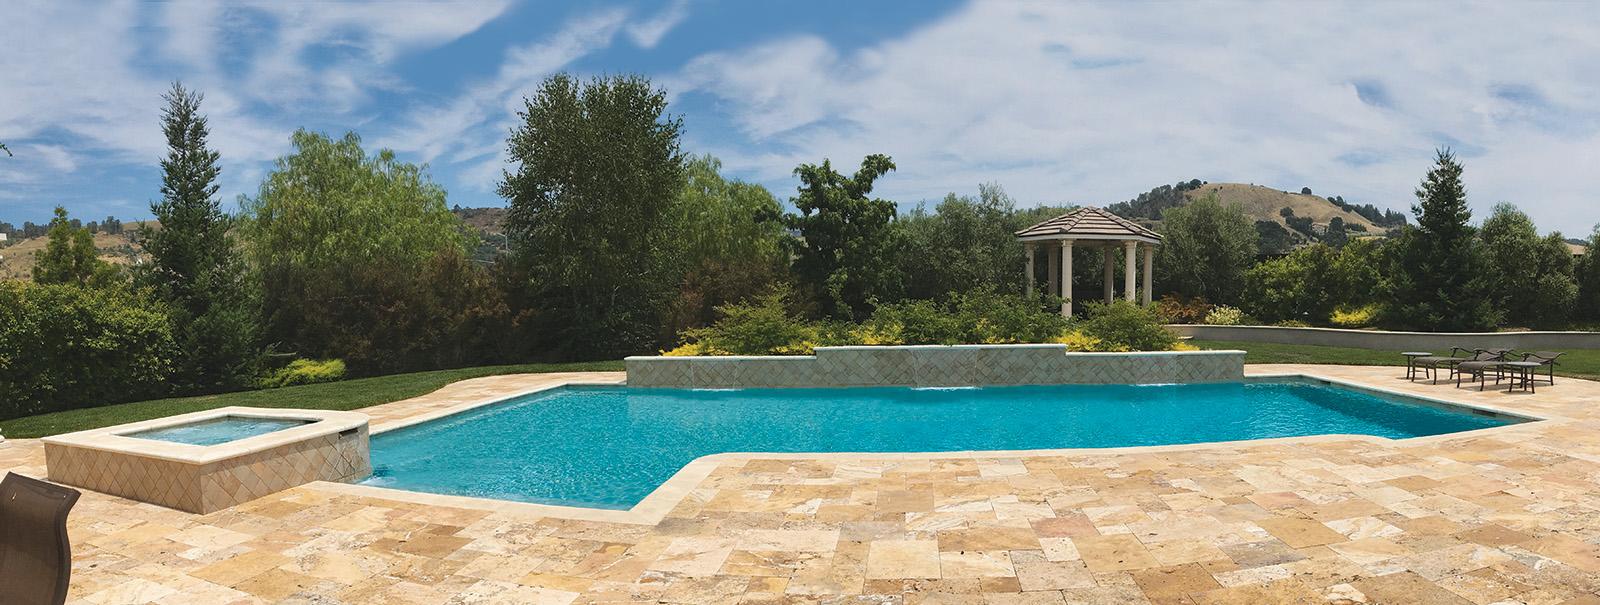 san diego swimming pool builder